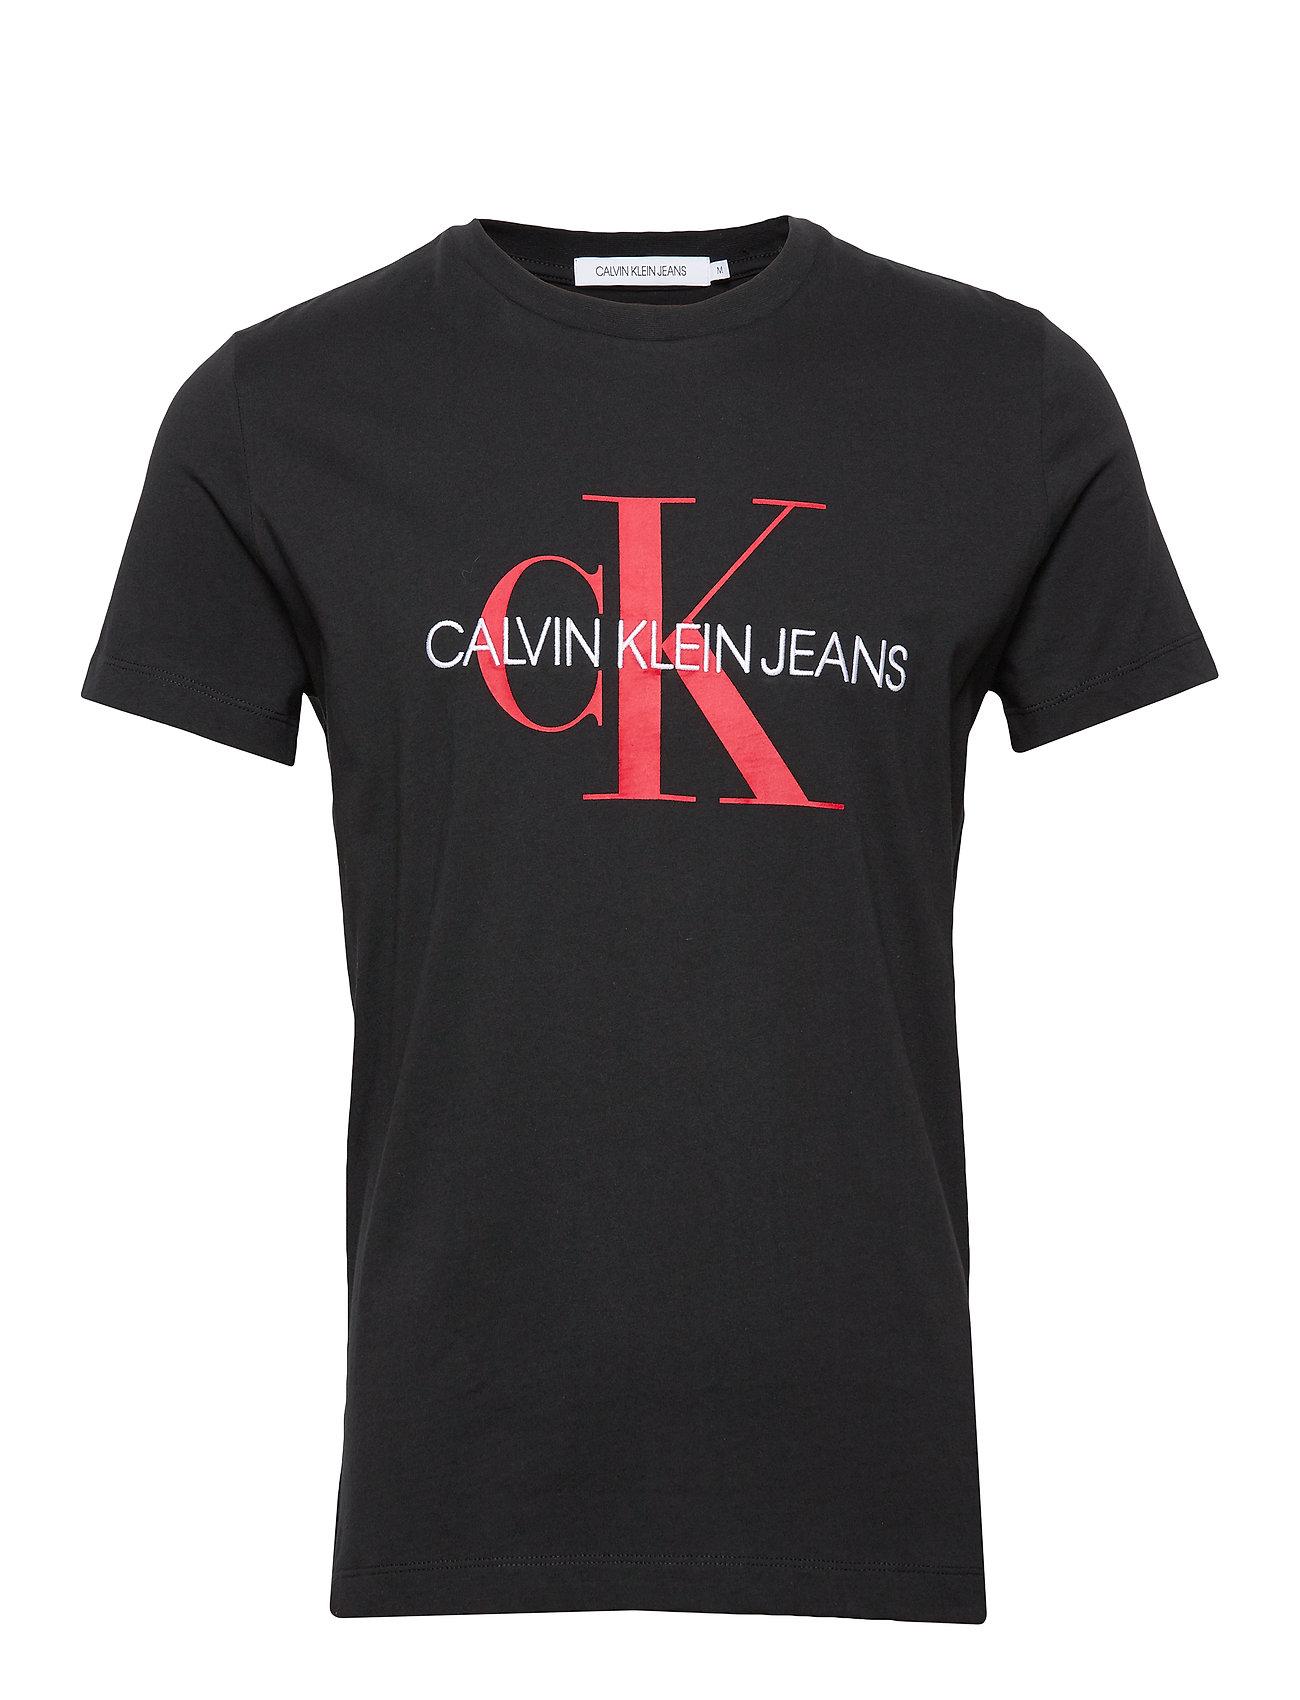 Calvin Klein Jeans MONOGRAM LOGO SLIM TEE - CK BLACK / RACING RED